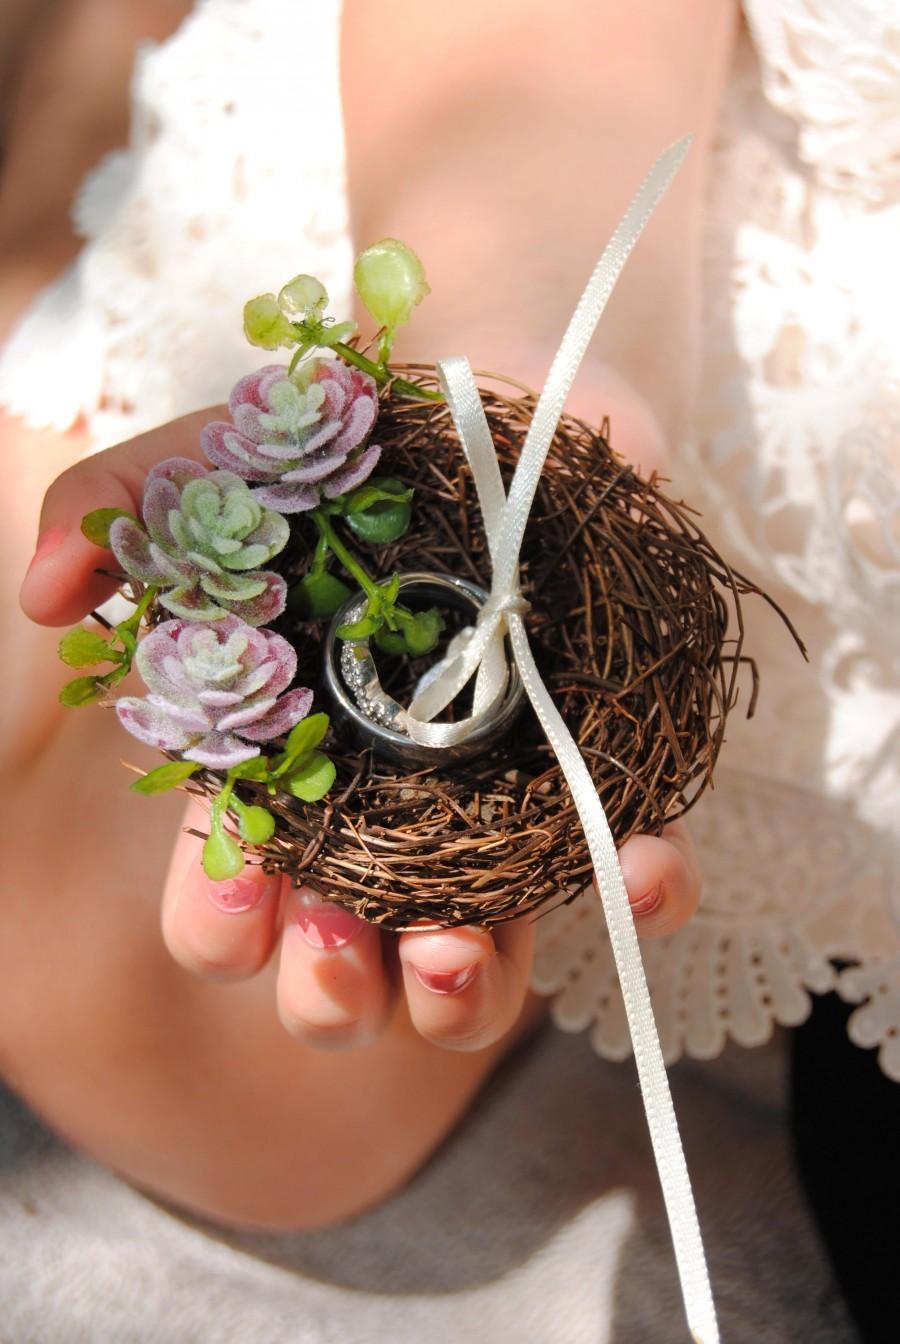 Wedding - Succulent Wedding - Bird Nest - Ring Holder - Rustic Ring Holder - Wedding Ring Pillow - Ring Bearer - Woodland Wedding - Rustic Ring Bearer